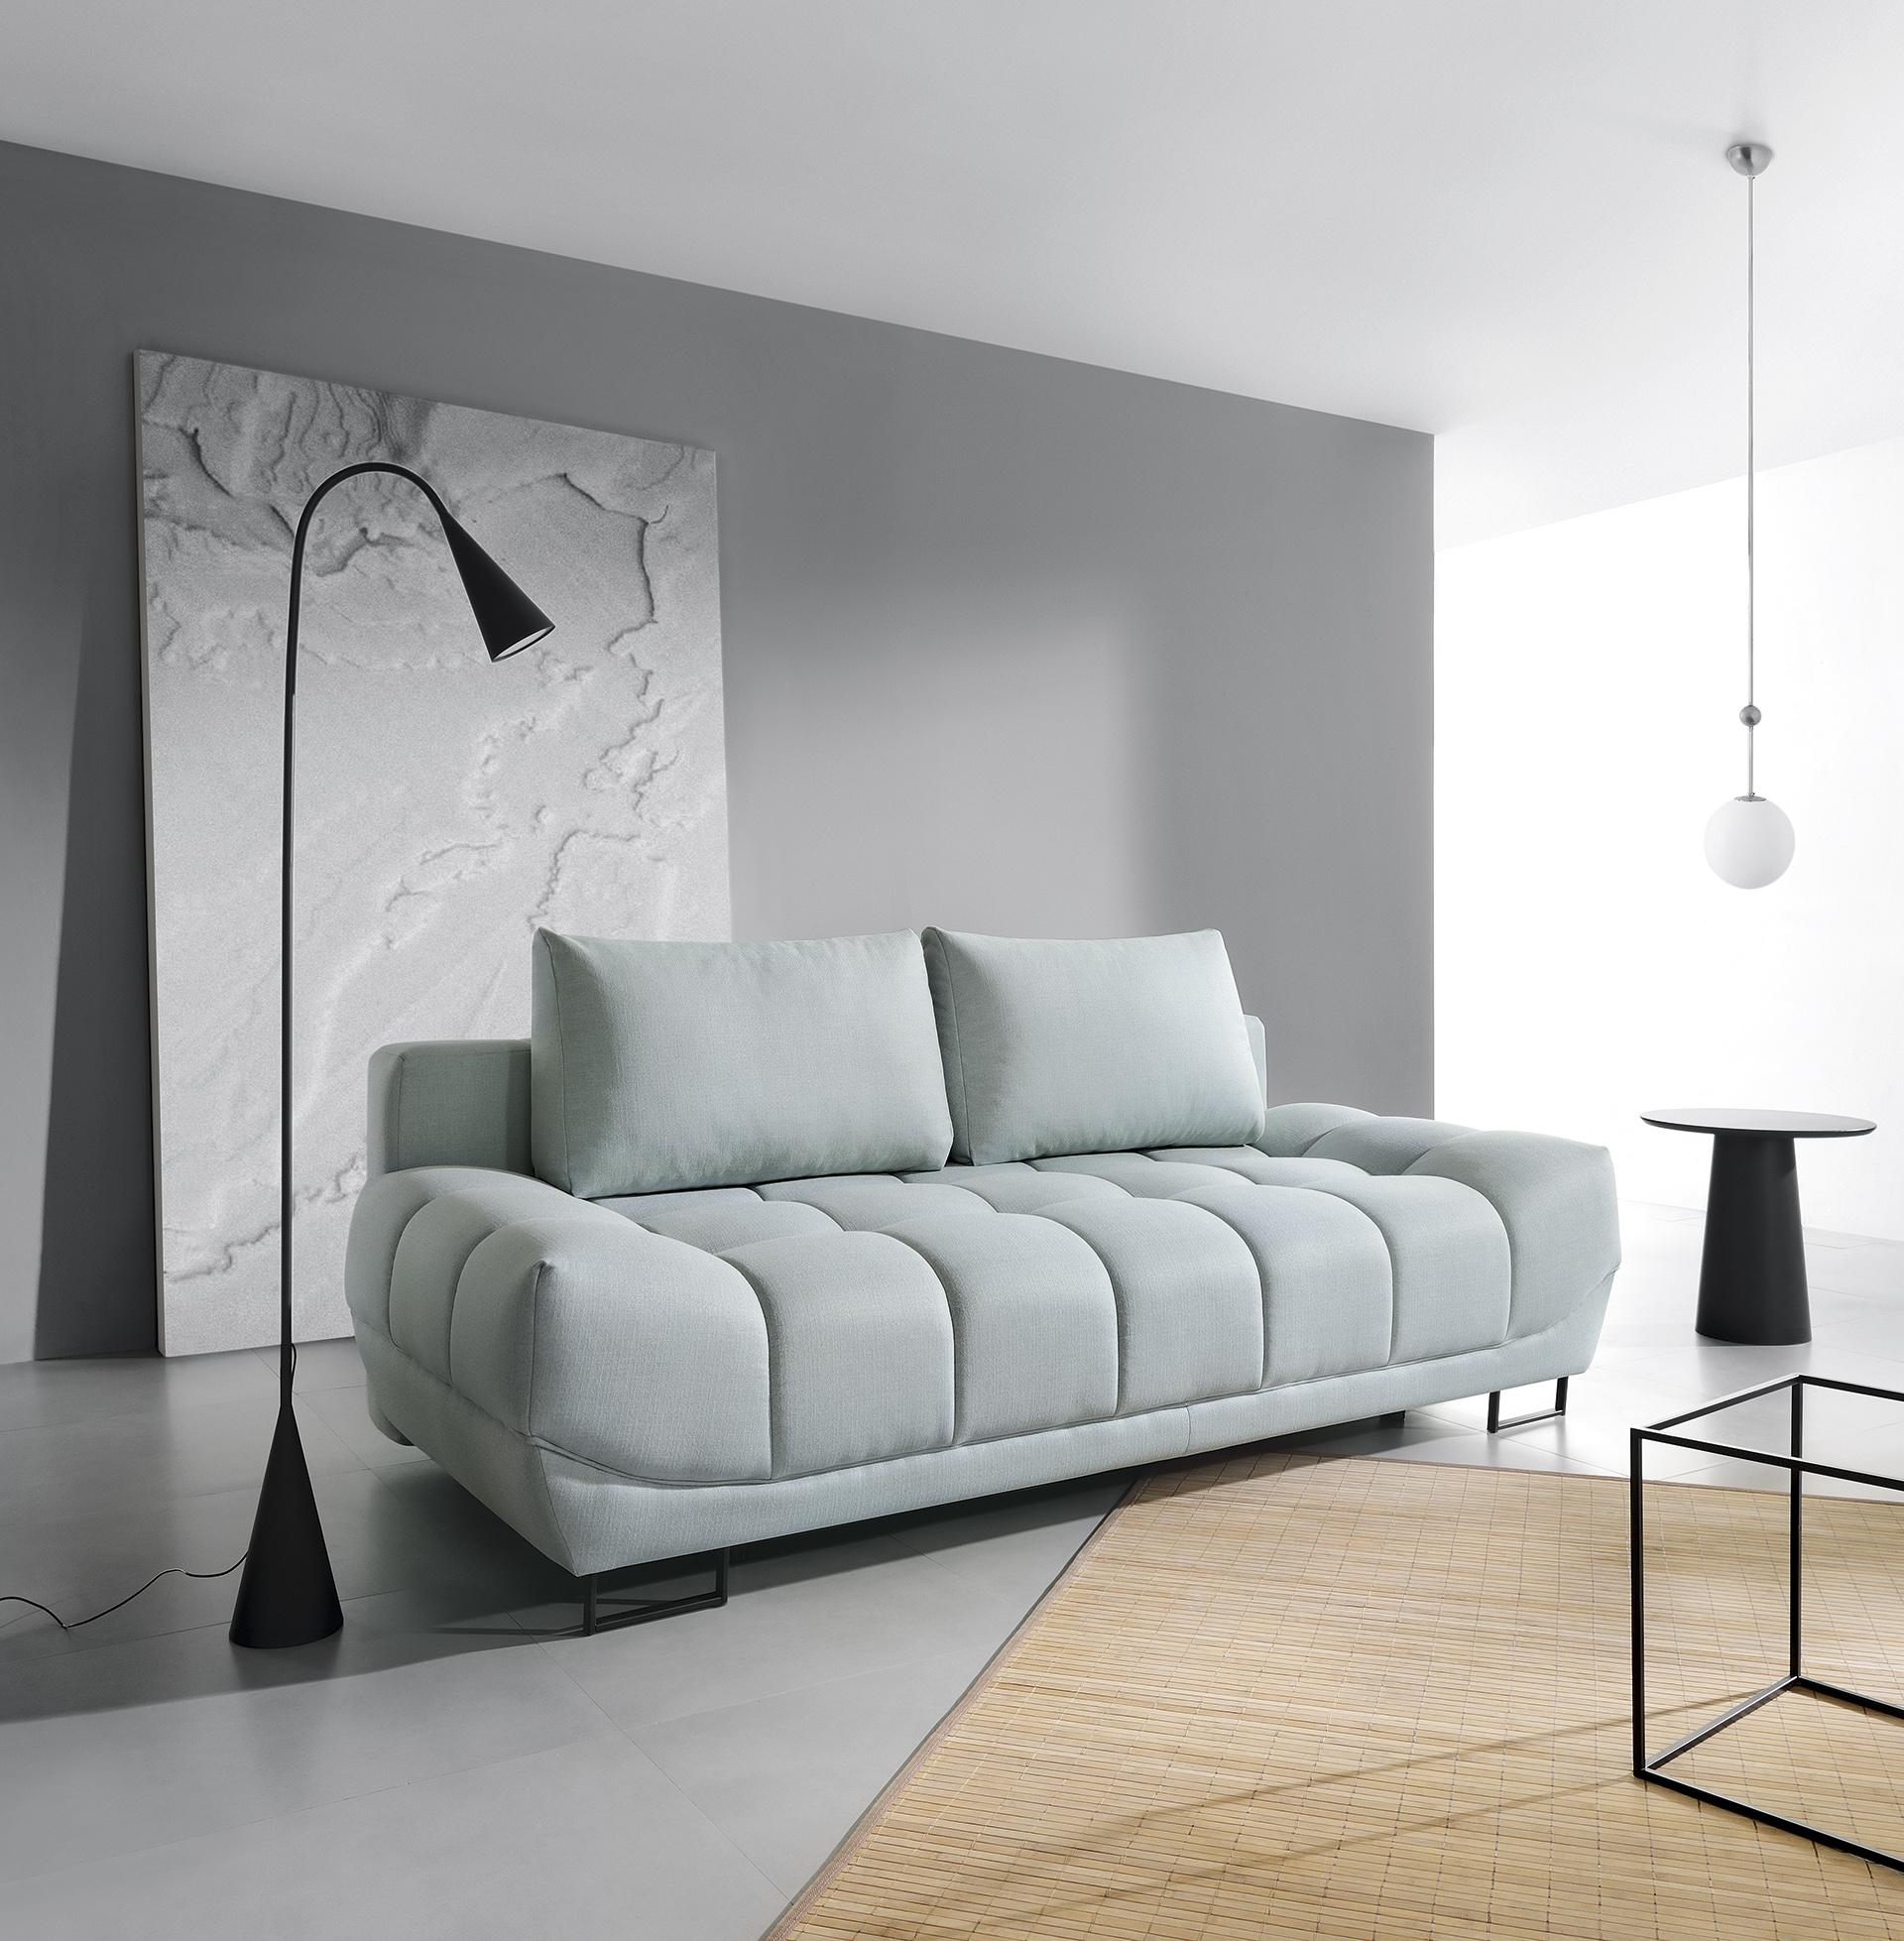 Canapea extensibila cu lada de depozitare, 3 locuri Venice Light Green, l218xA112xH71 cm